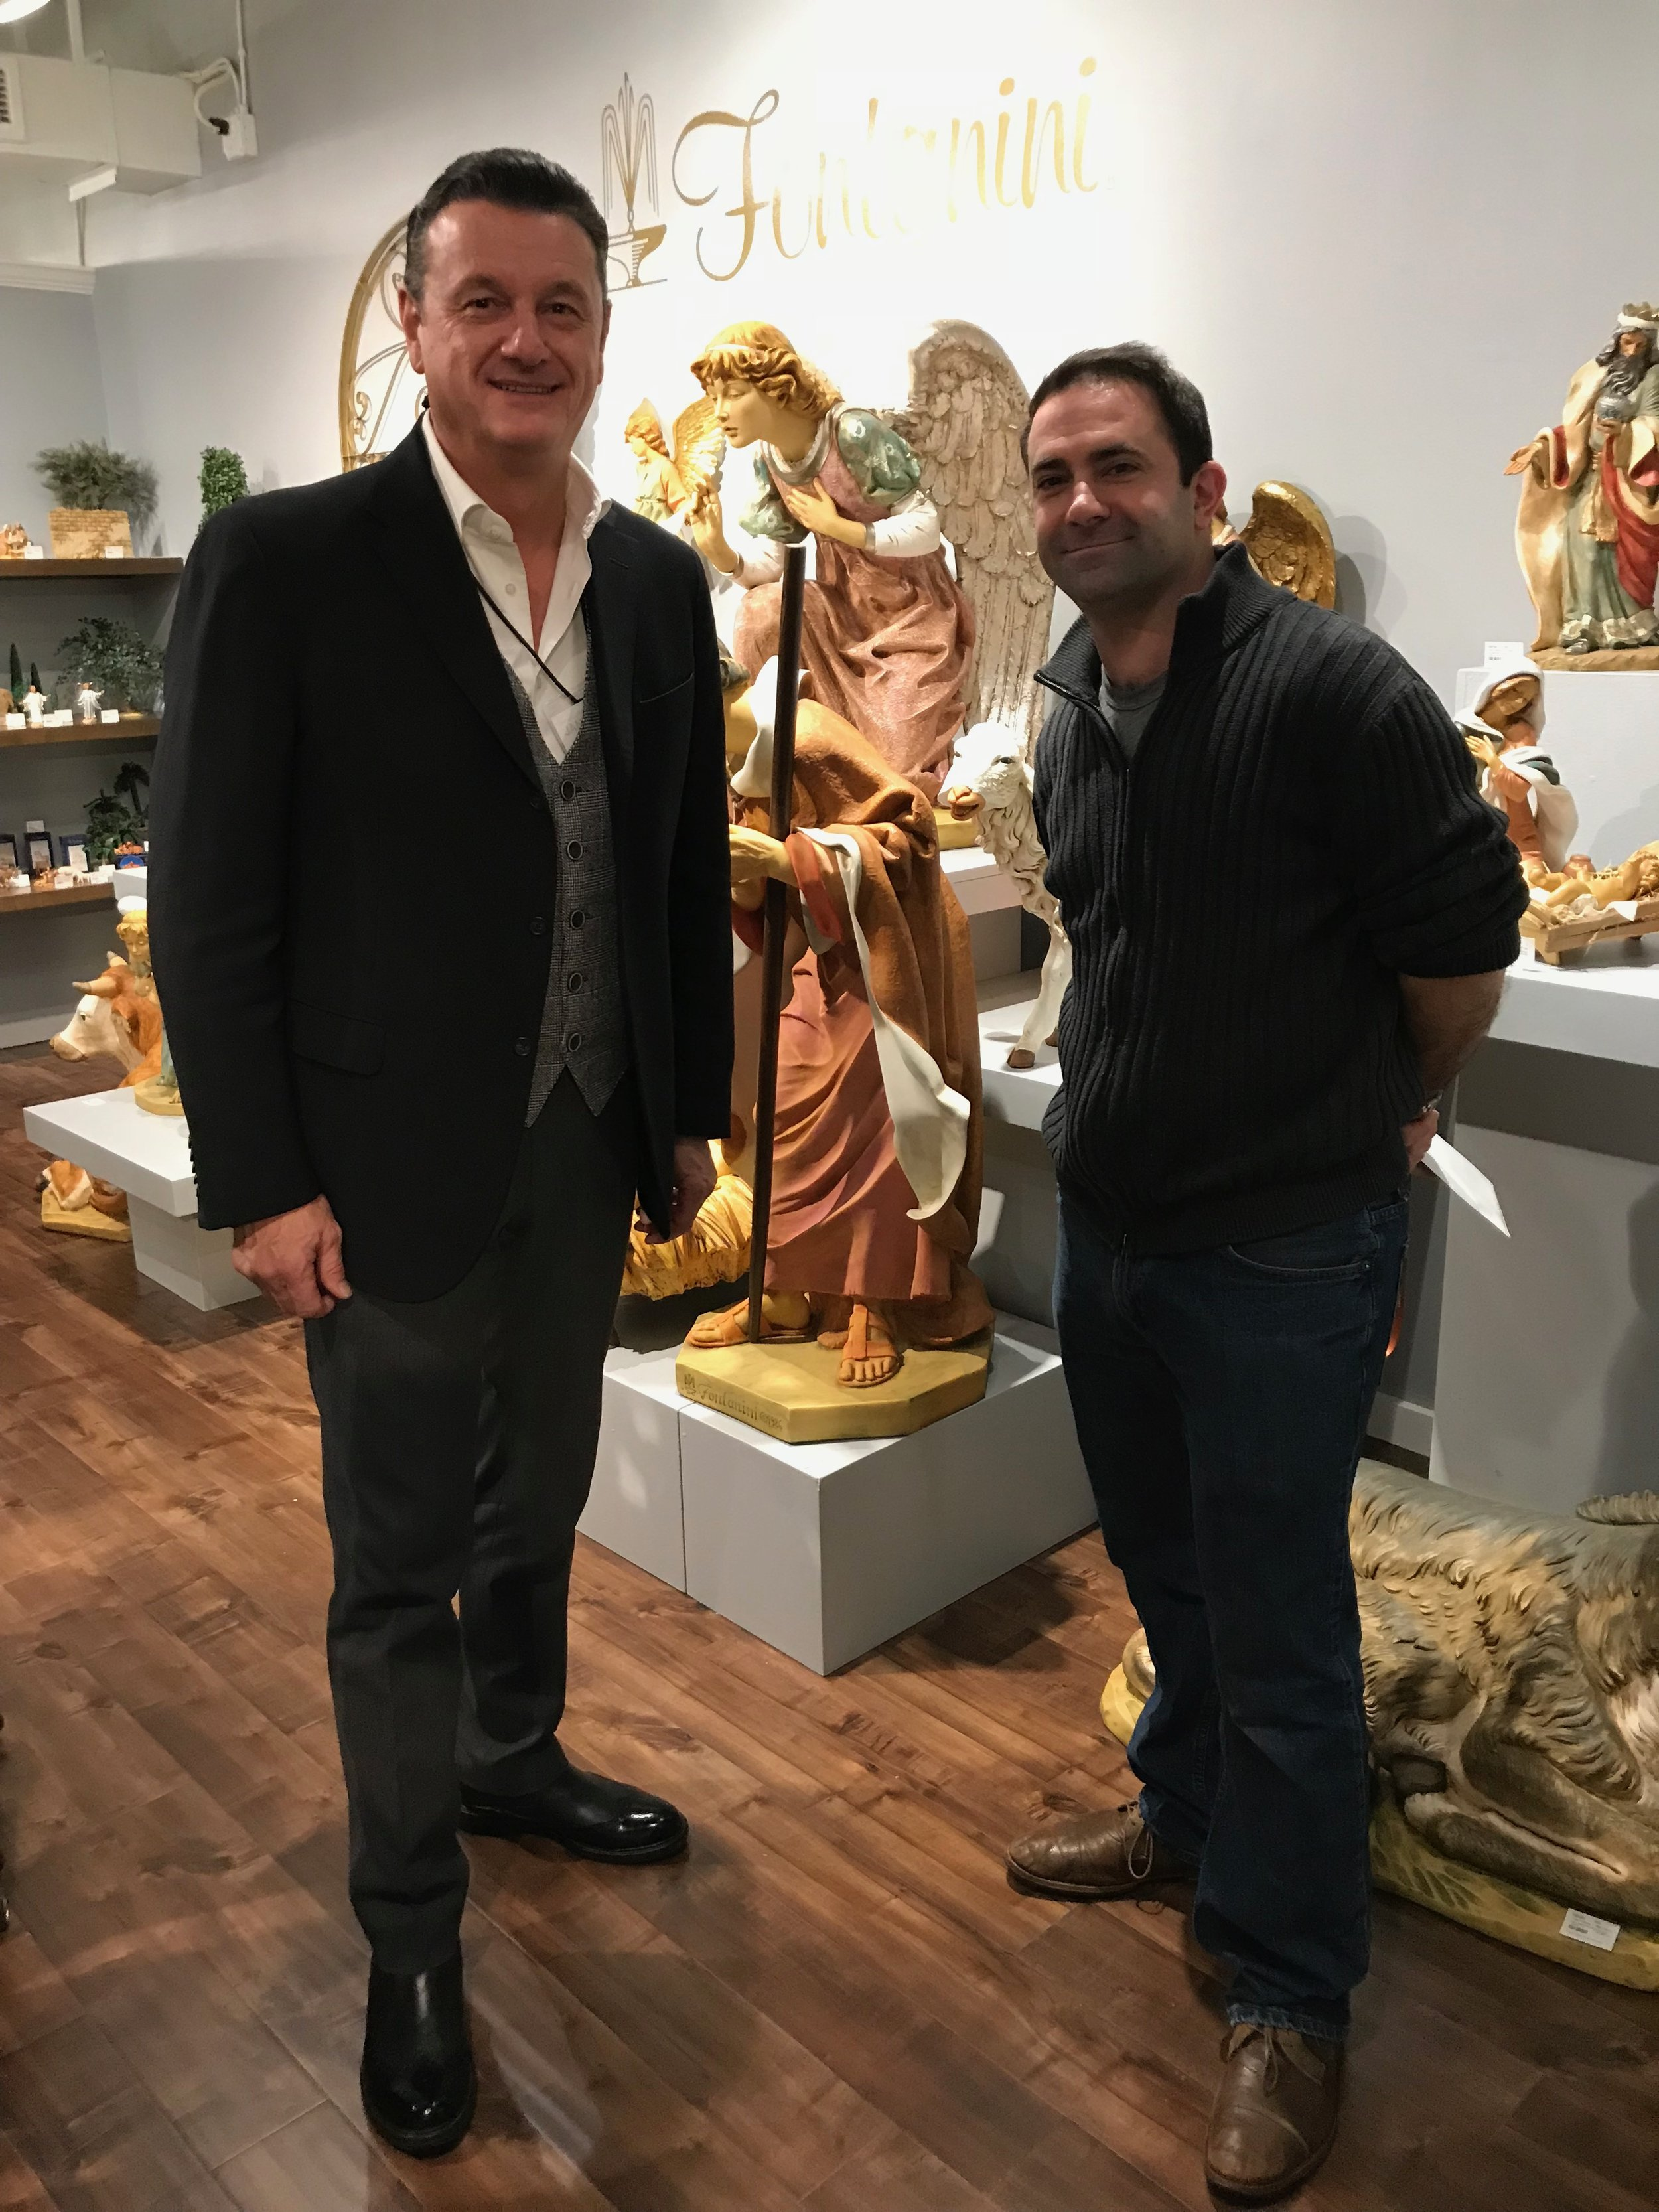 A.J. meeting with Emmanuel Fontanini